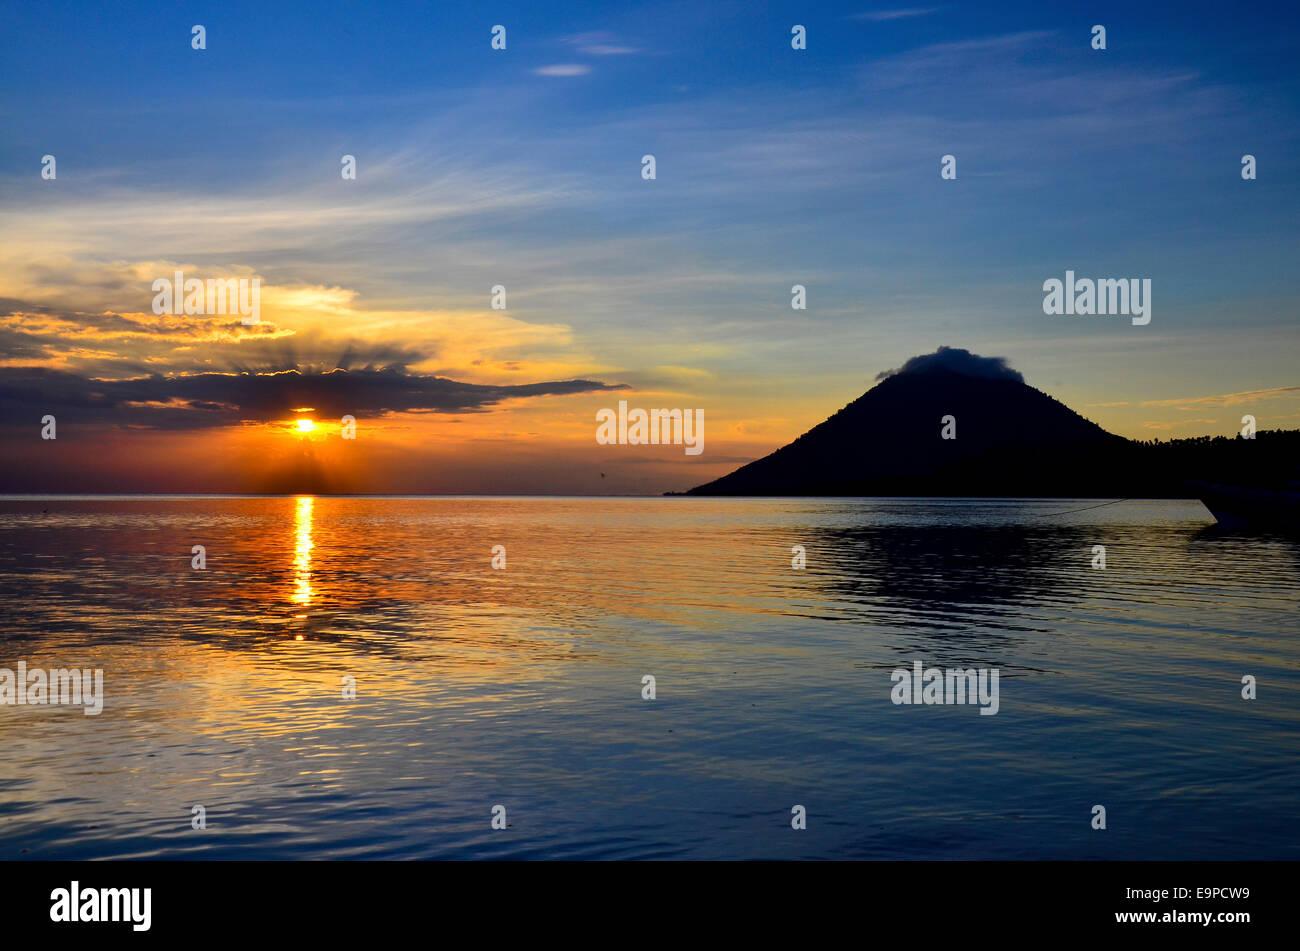 Volcano Manado Tua, Bunaken National Park, Sulawesi, Indonesia - Stock Image